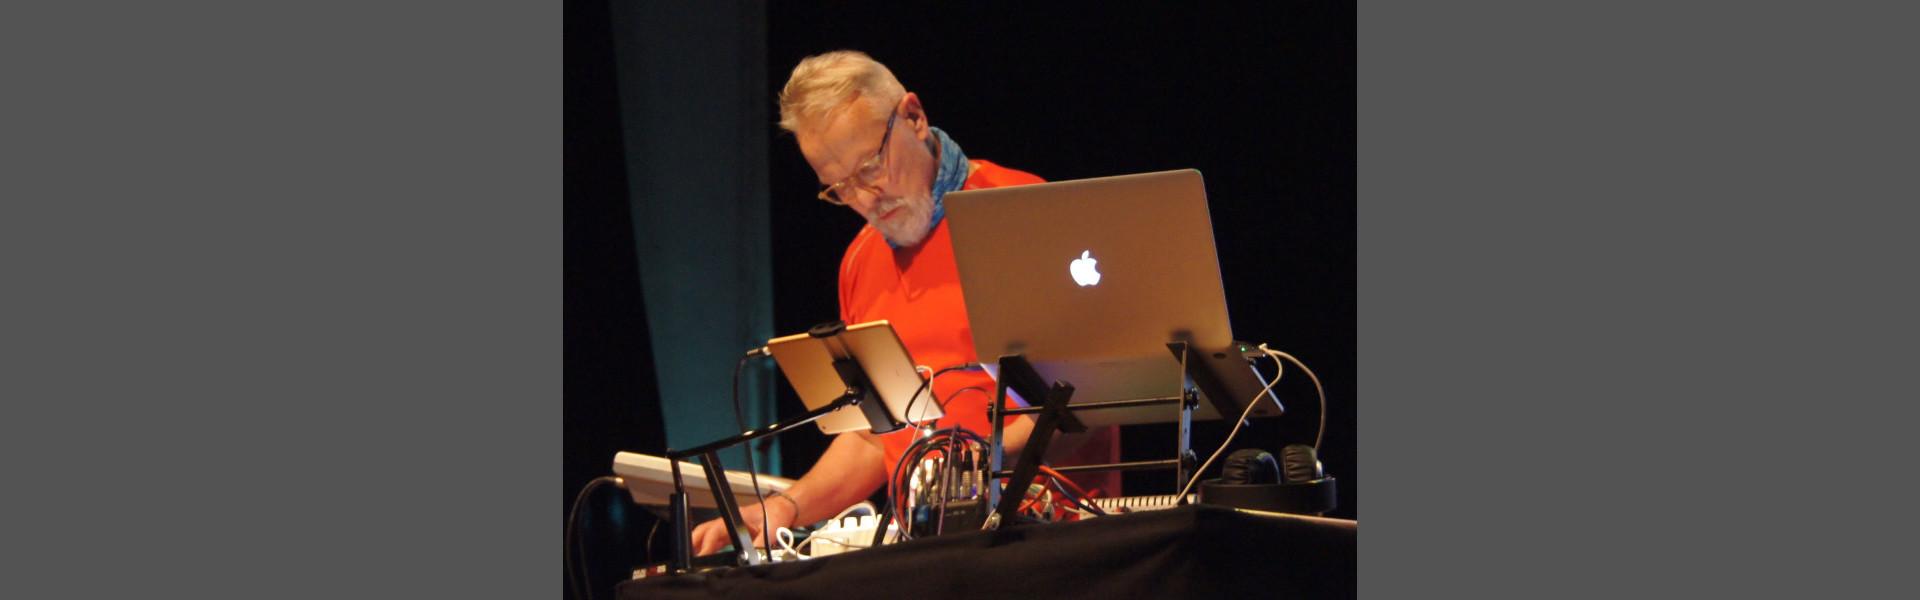 Harald Grosskopf / Phase3